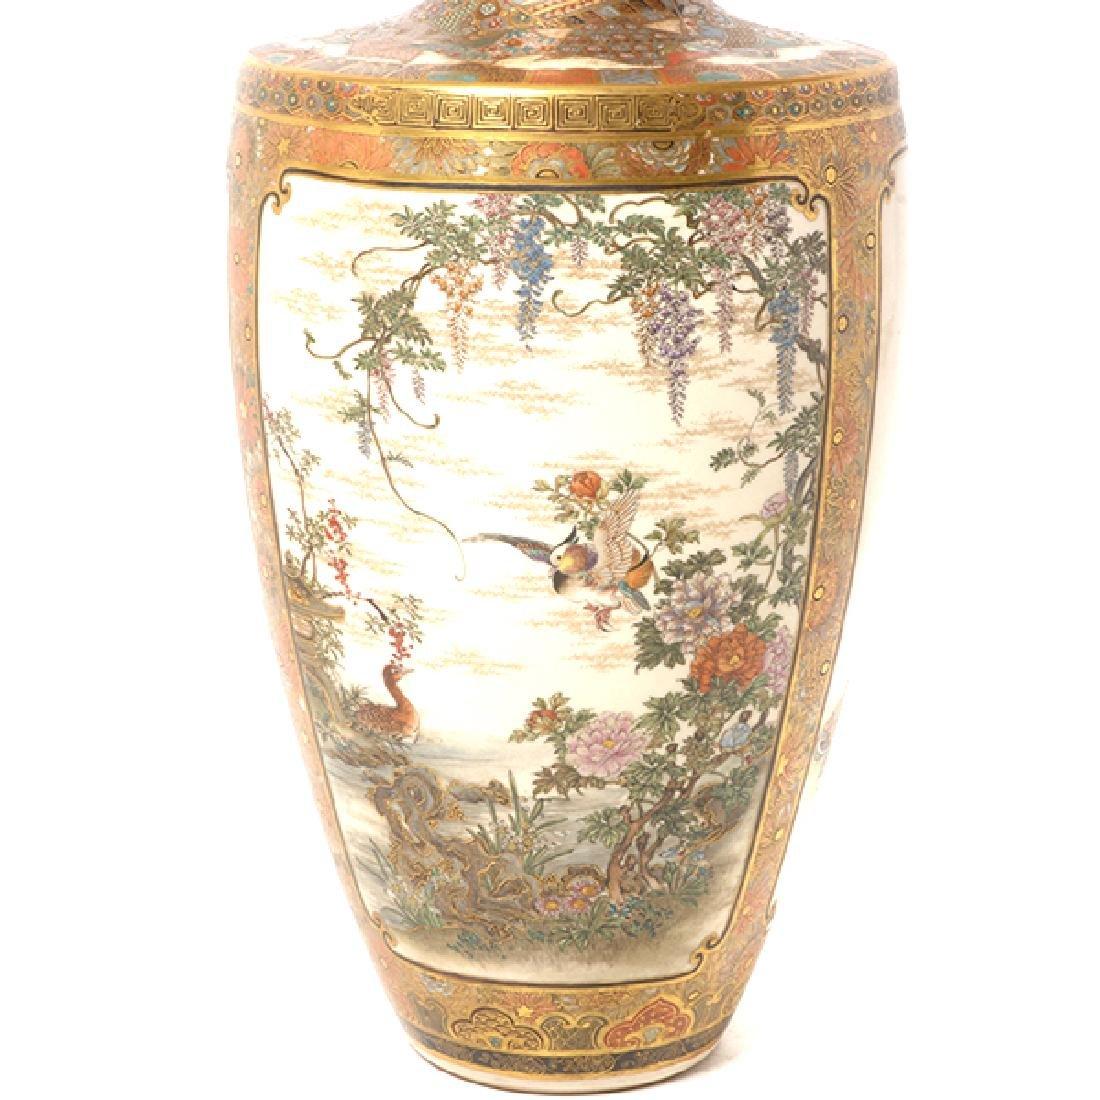 A Pair of Satsuma Vases By Okamoto Ryozan, Meiji Period - 5